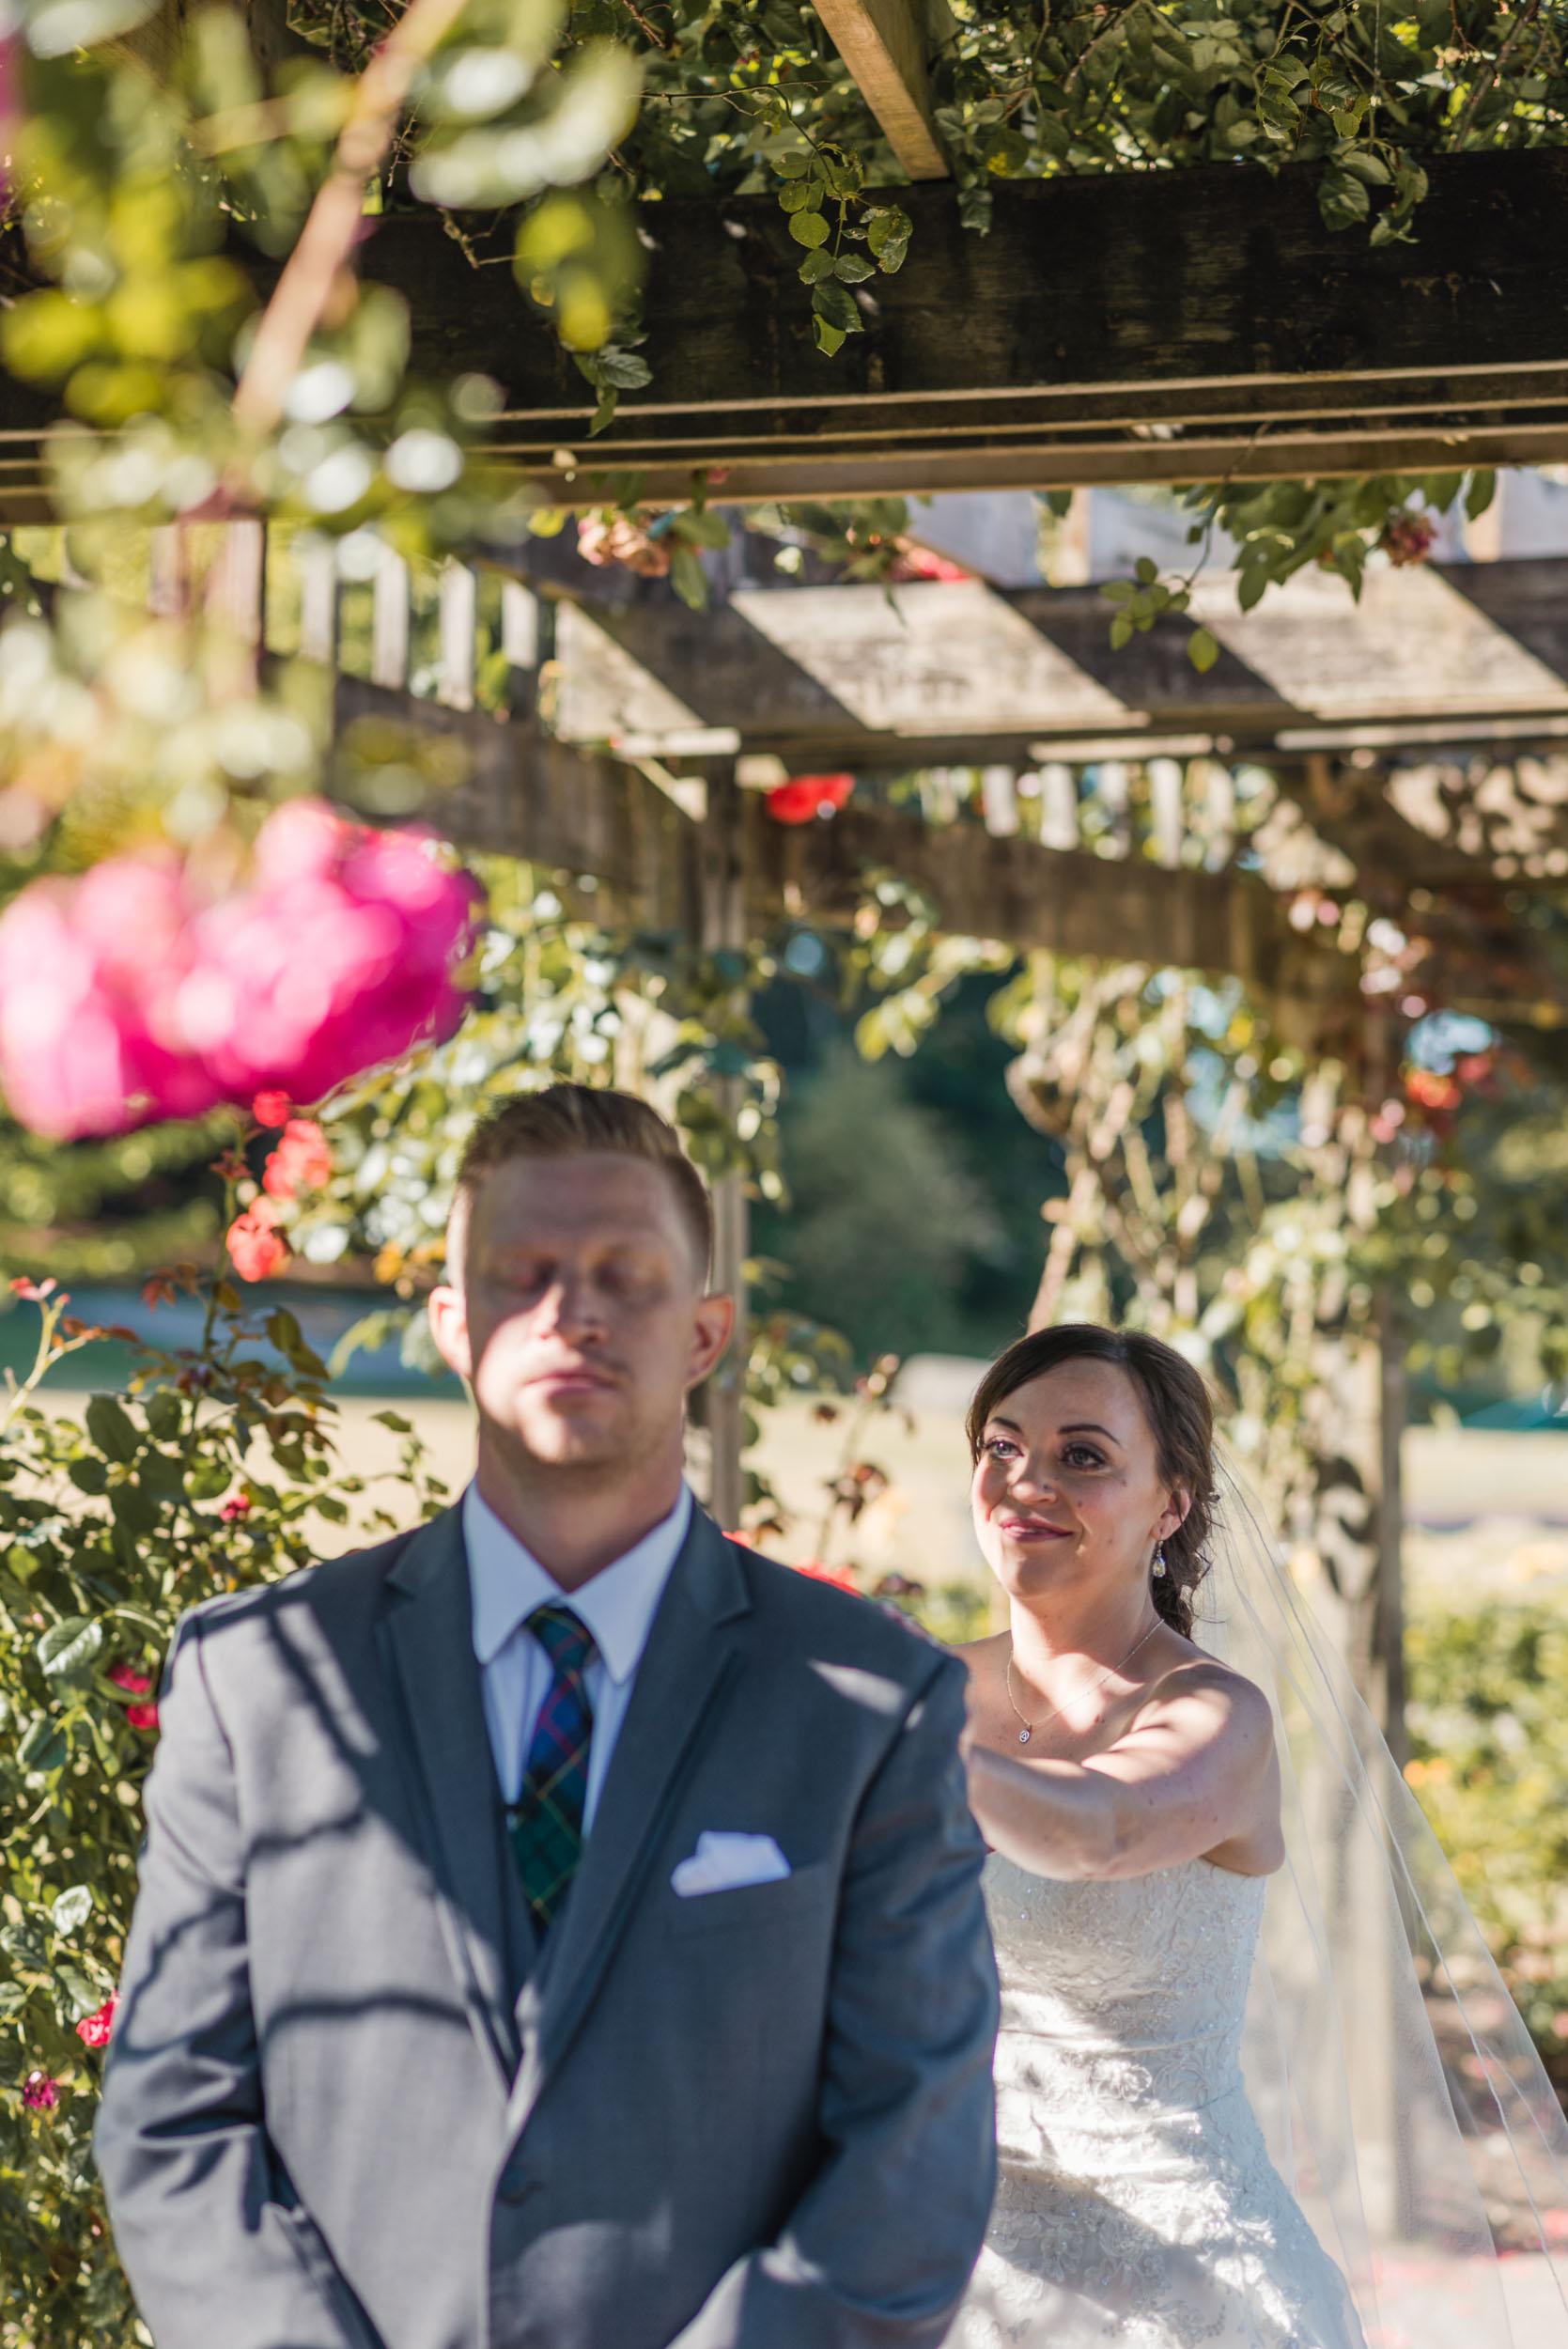 First look Bride and Groom in rose garden